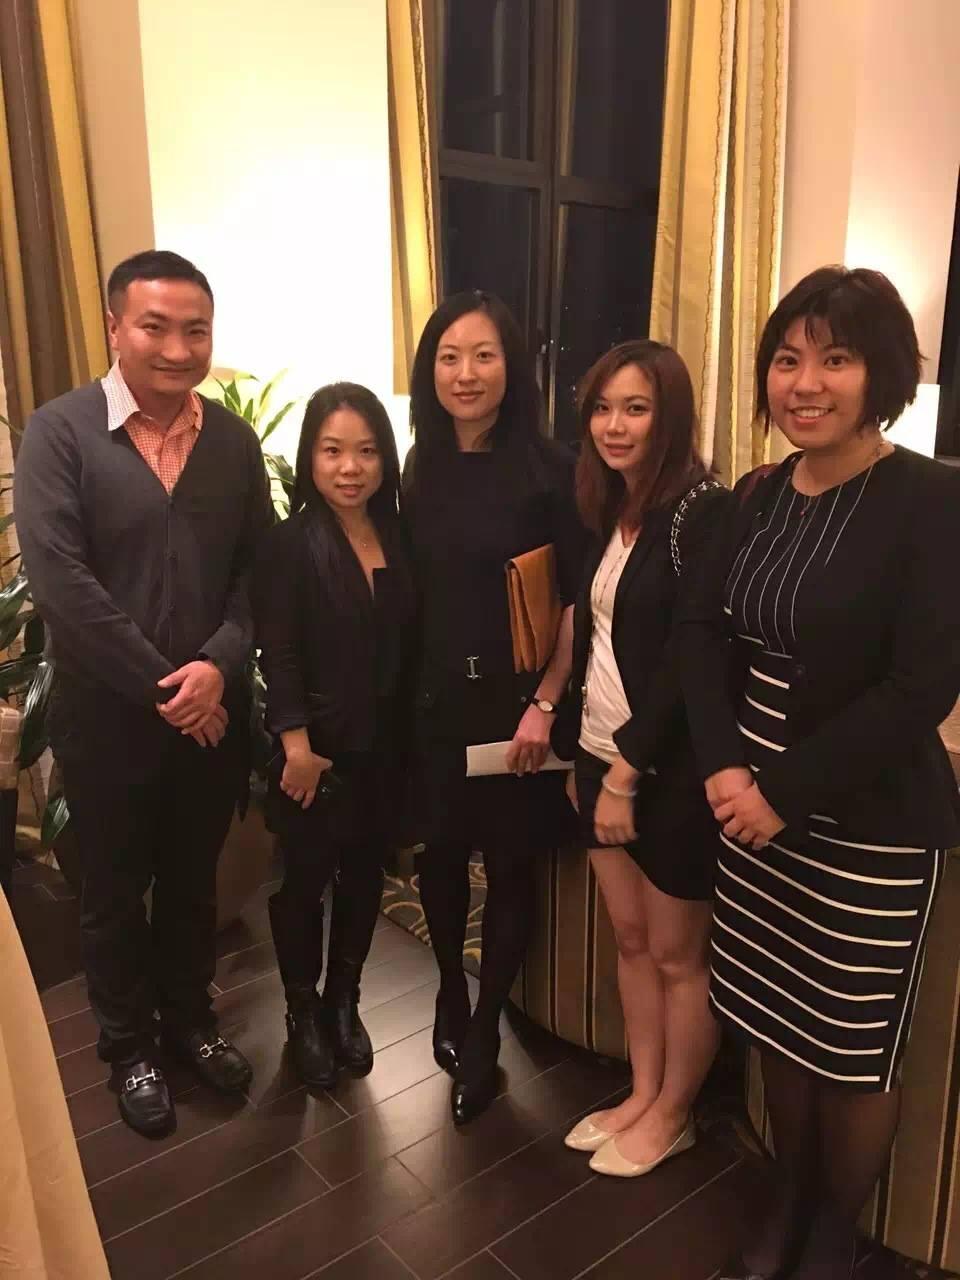 Jason Song (L&L Travel- Director of Production, tickets dept.), Katie Yu (L&L Travel - Marketing Director), Lian Liu (NYC & Company -Director, Tourism Development), Mina Su (UAP Media-Advertising director), Sasha Chou (UAP Media-Director of sales and marketing)